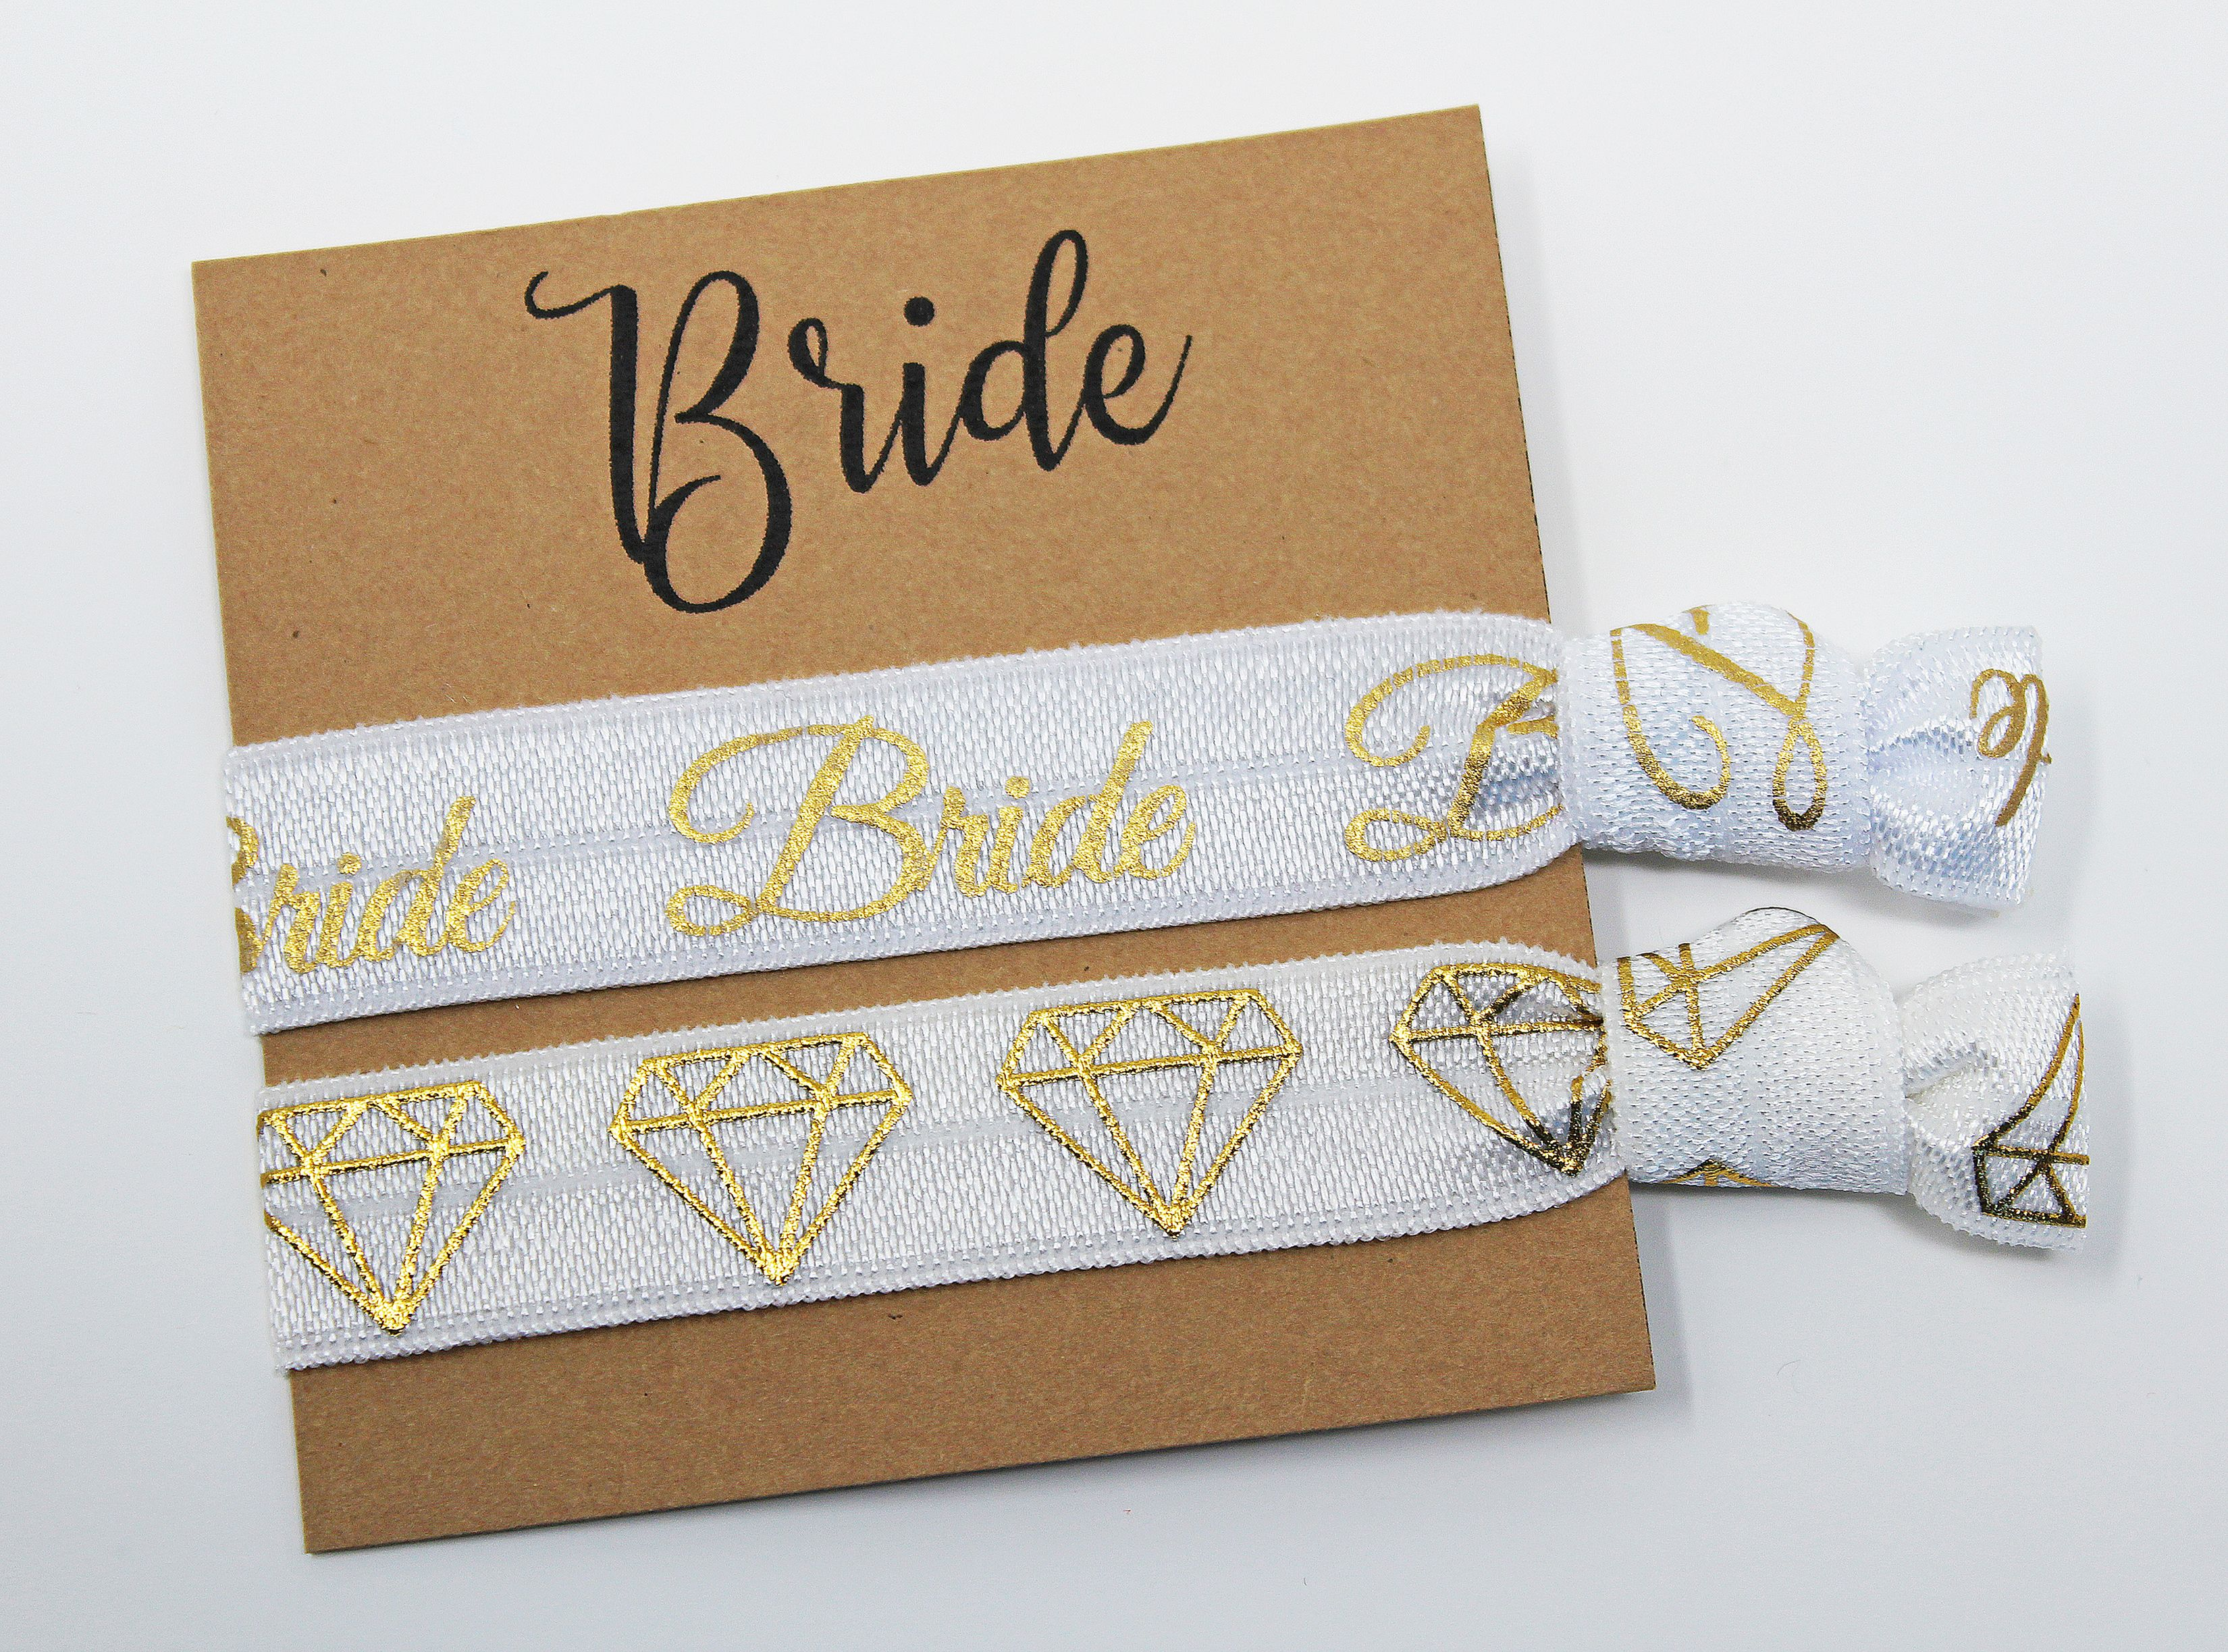 Bride Squad Gift Bride  Bride Squad Hair Tie Bracelet Elastic Hair Ties No Crease Hair Ties Bridesmaid Proposal Gifts